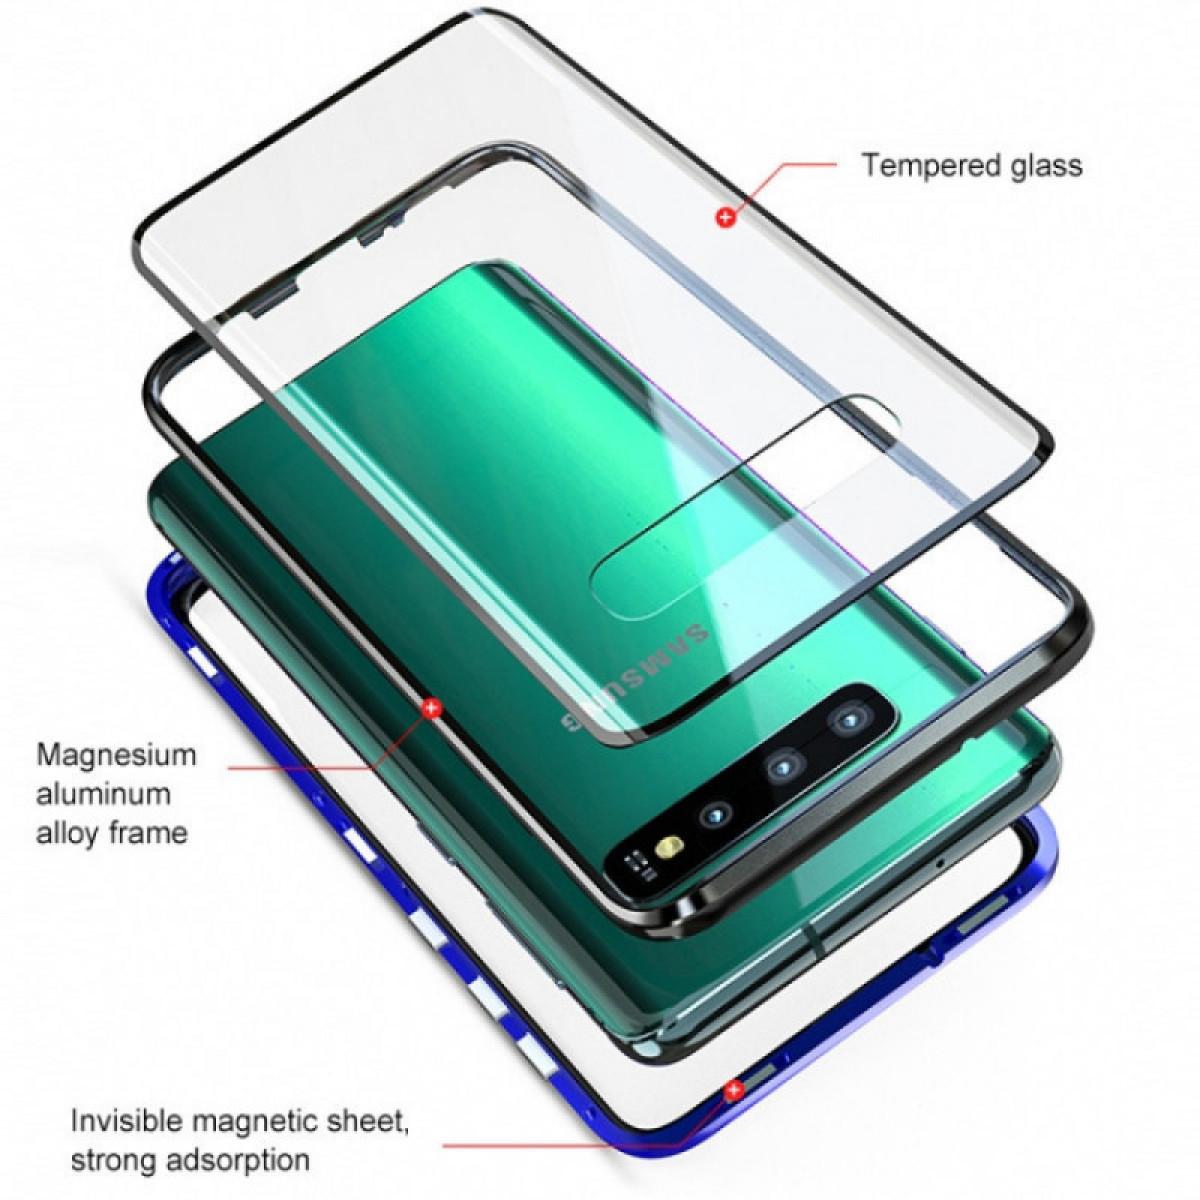 Двусторонний магнитный чехол Magnetic Angular Frame Tempered Glass на Самсунг Галакси S9 - черный